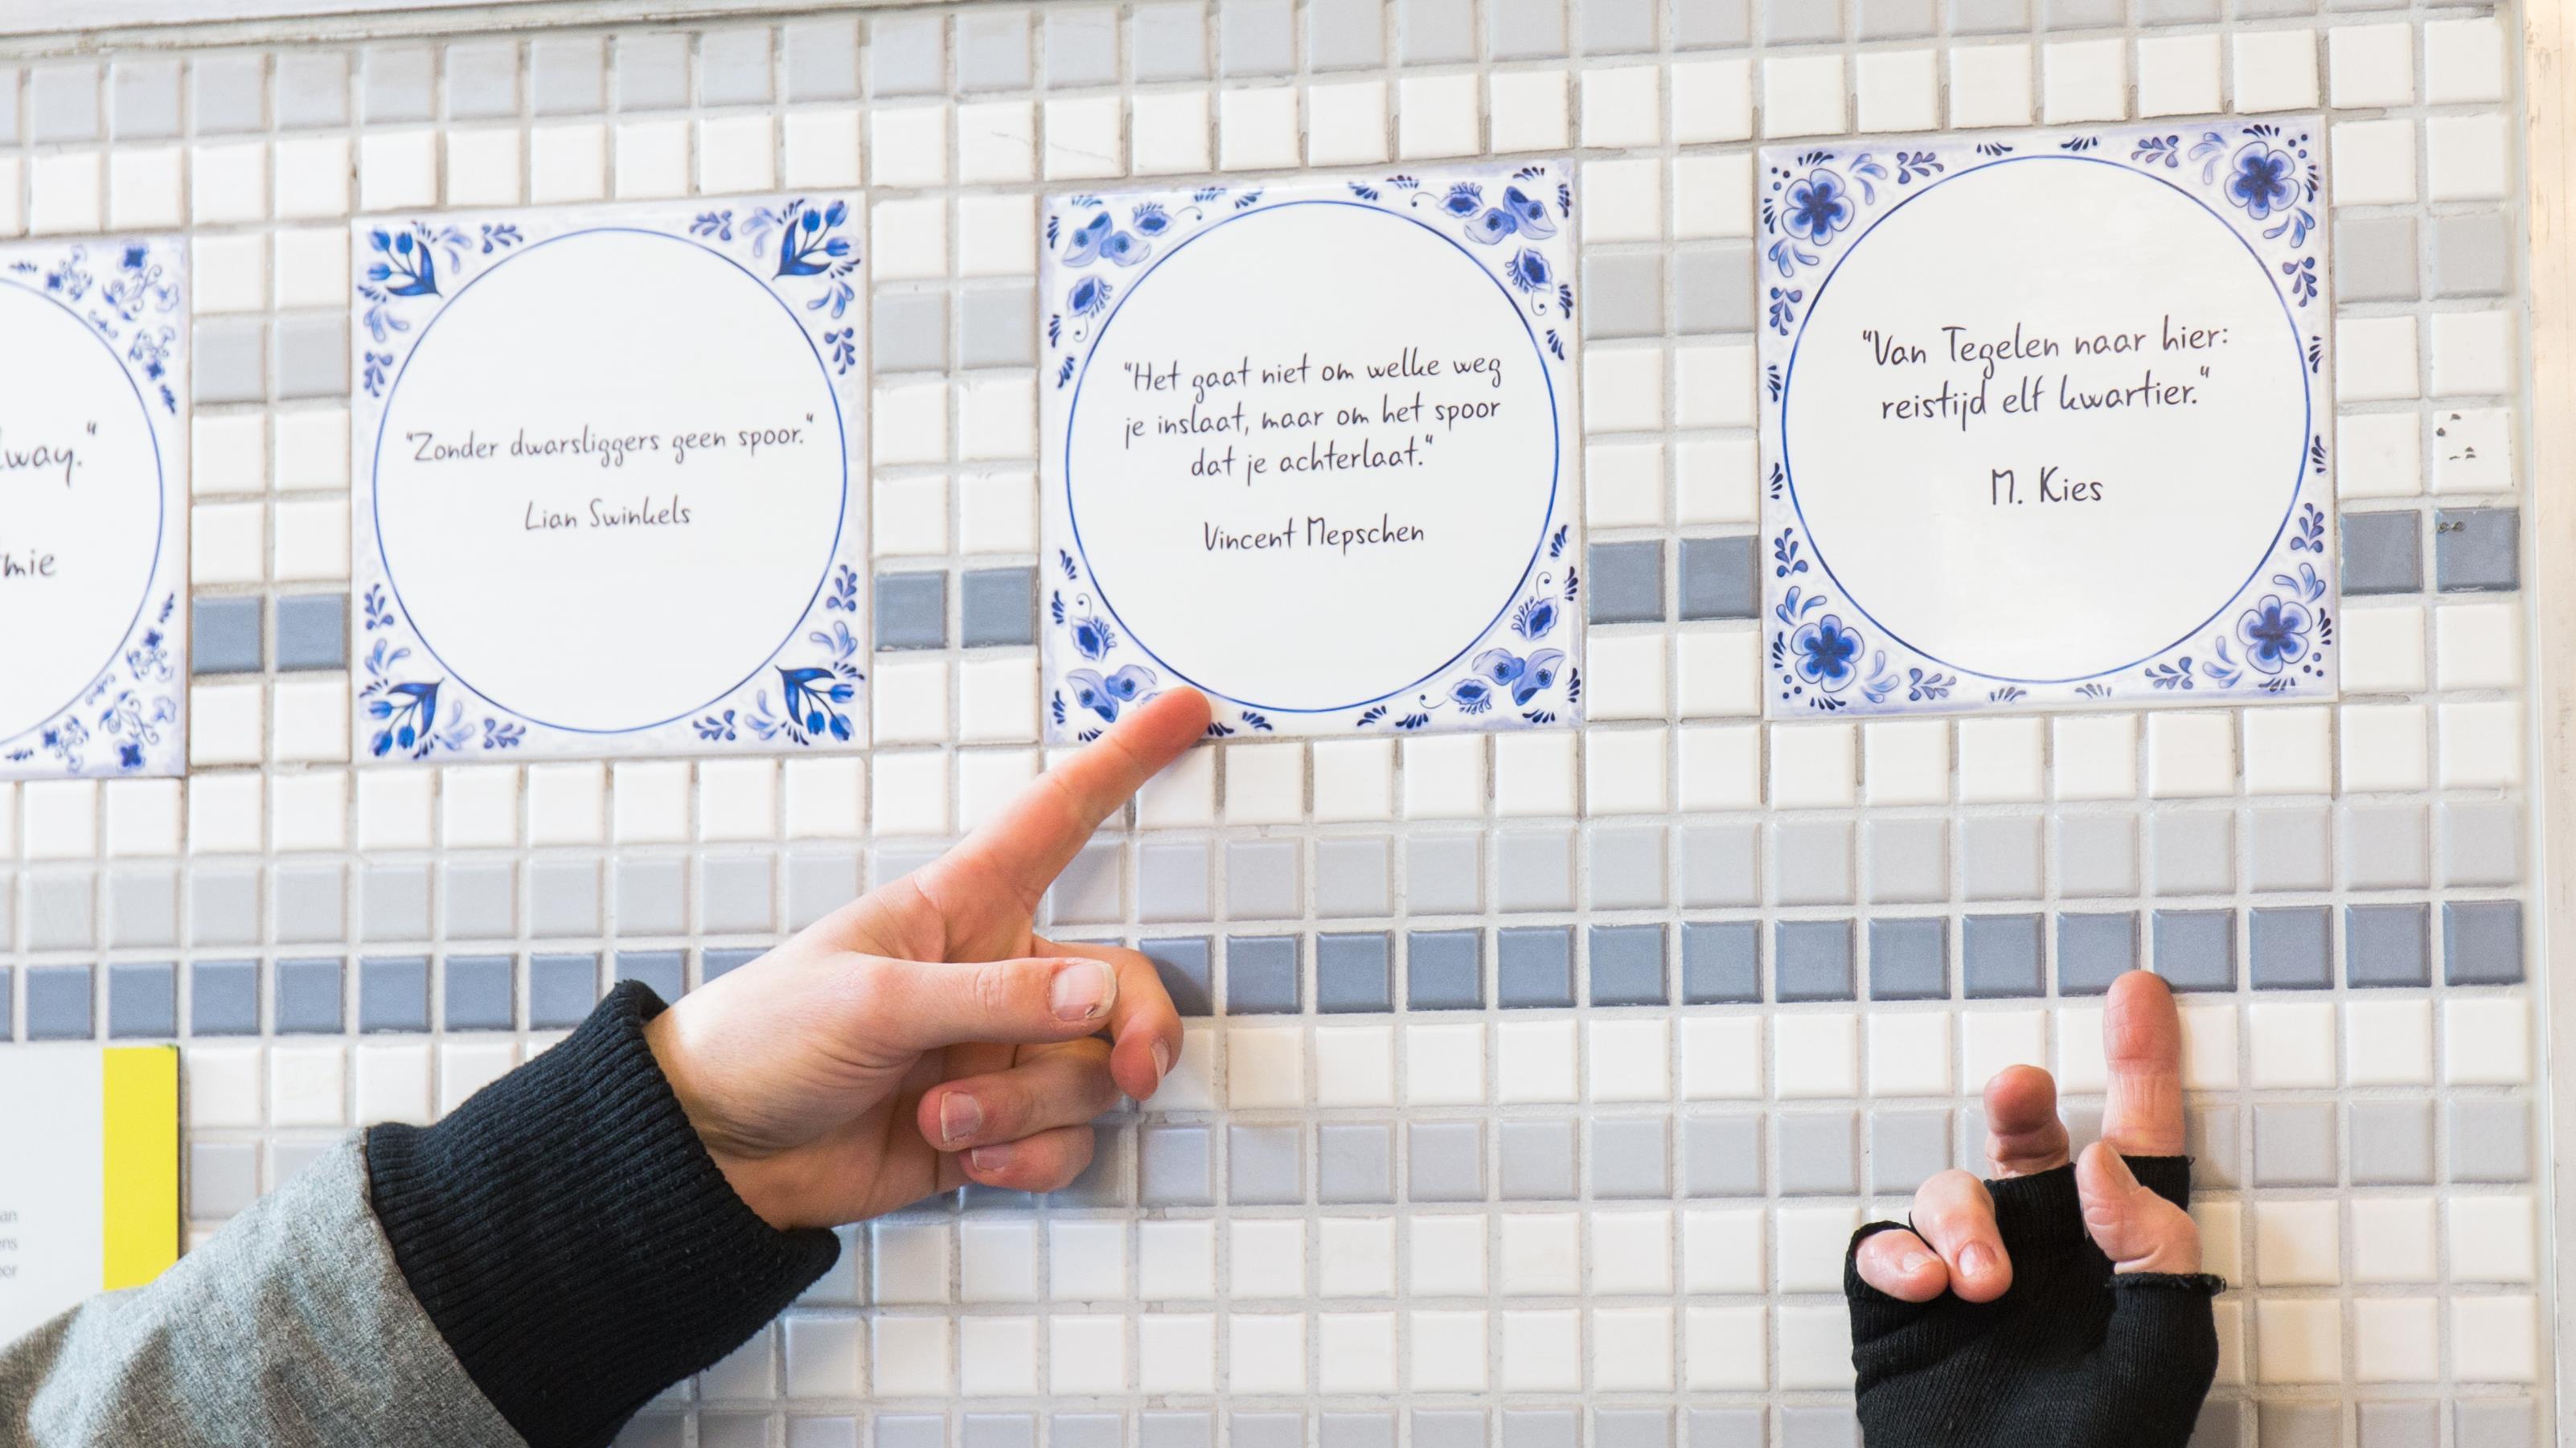 Spreuken Op Tegels : Top spreuken maken usi wofosogo